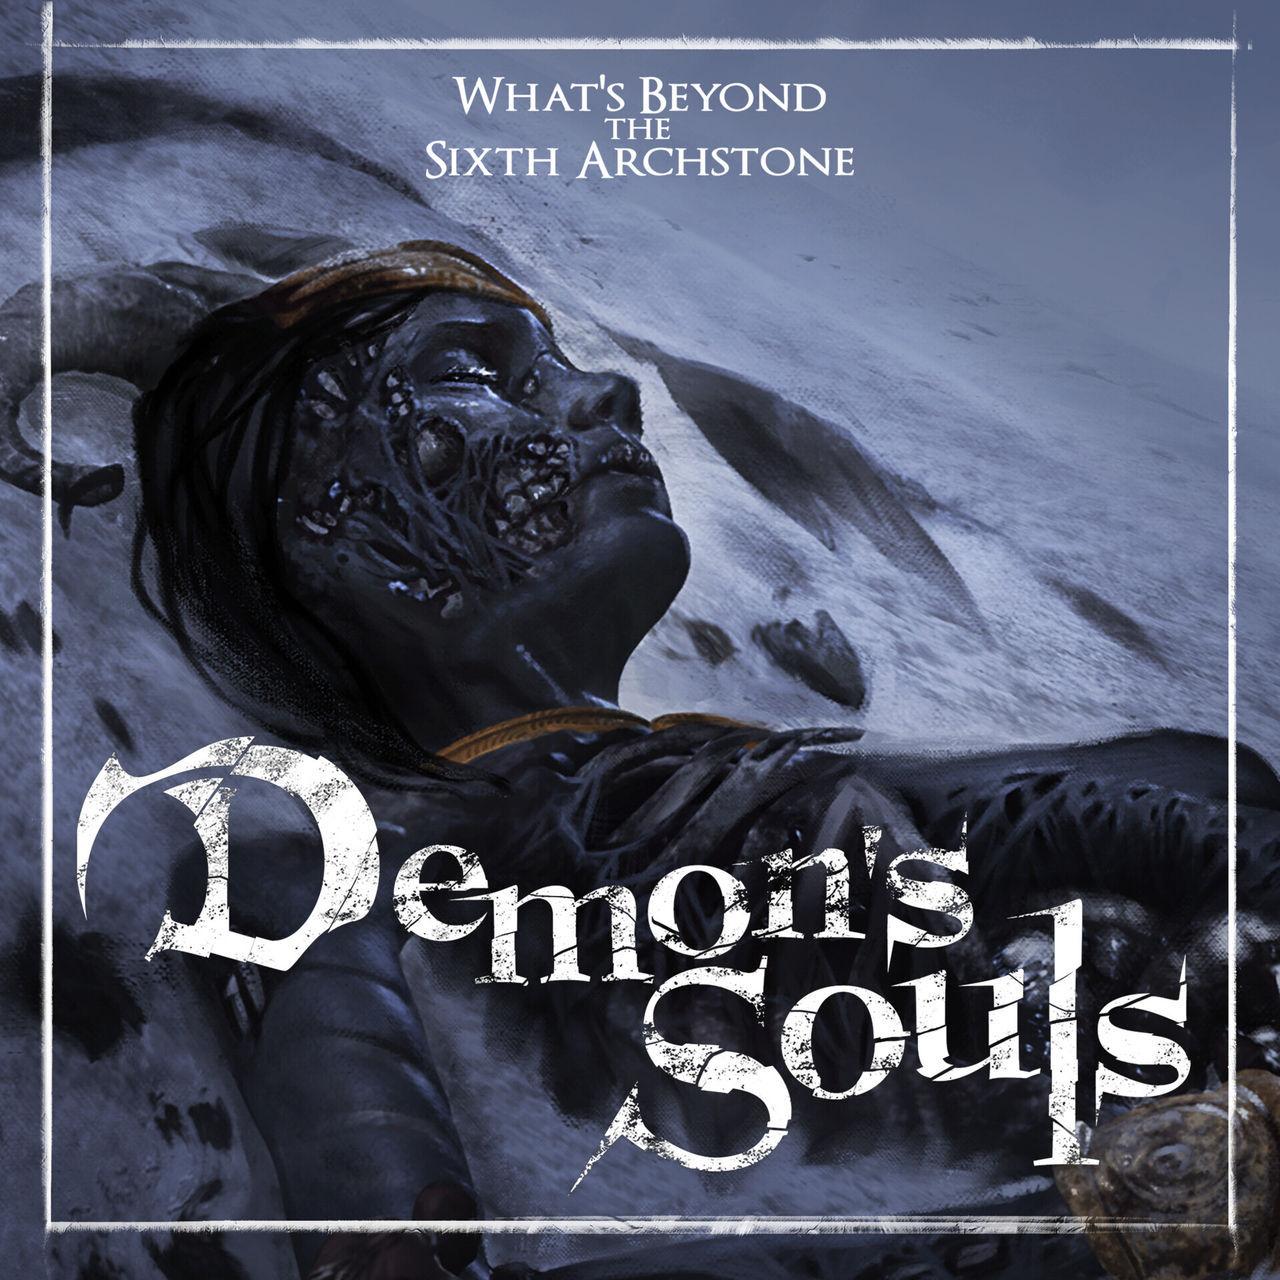 Demon's Souls la Sexta Archipiedra